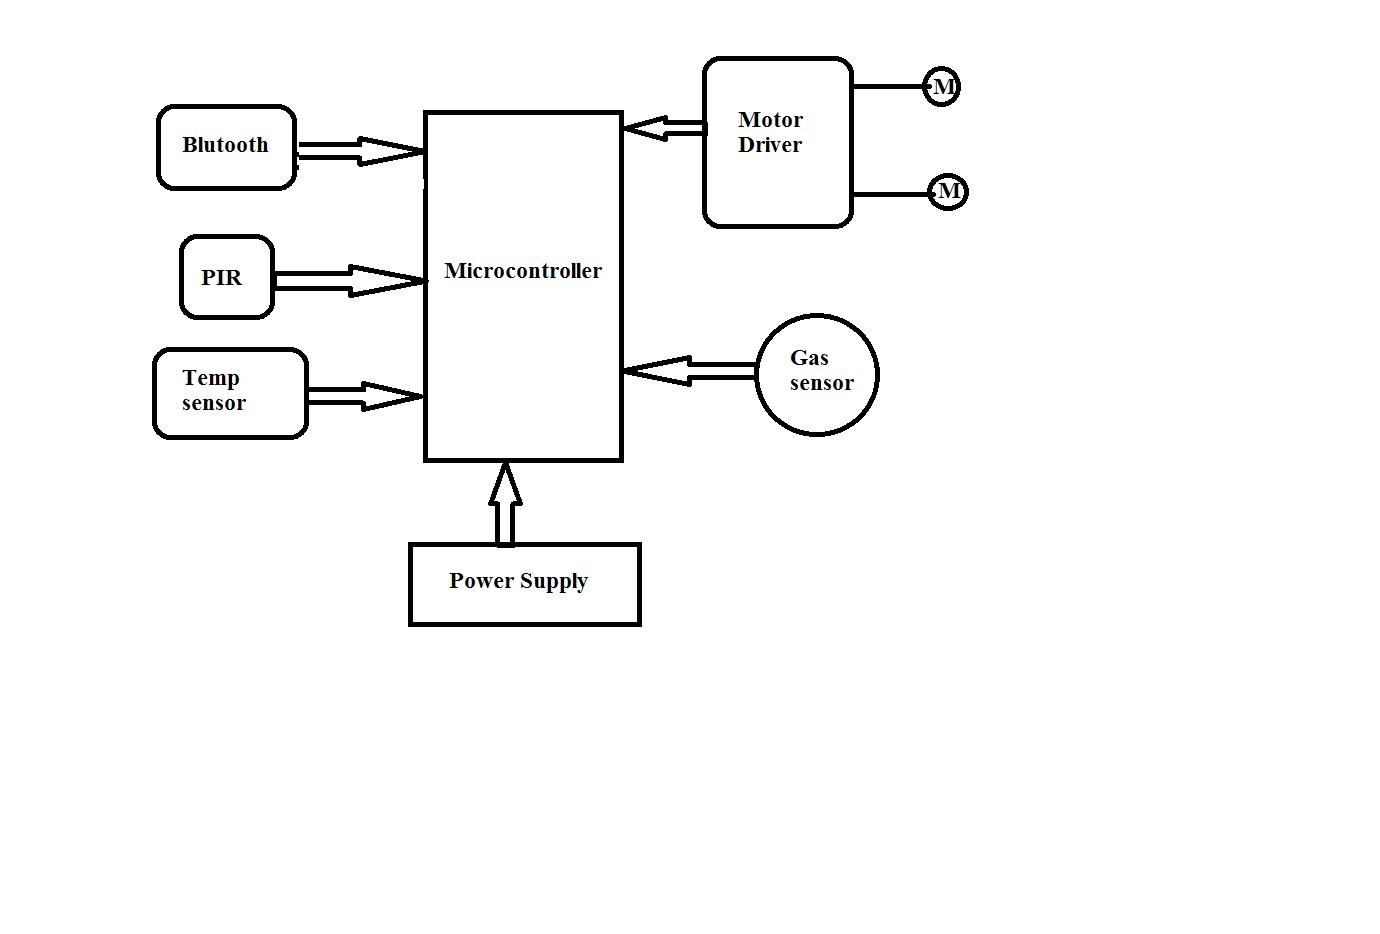 coal mine rescue robot block diagram [ 1380 x 934 Pixel ]